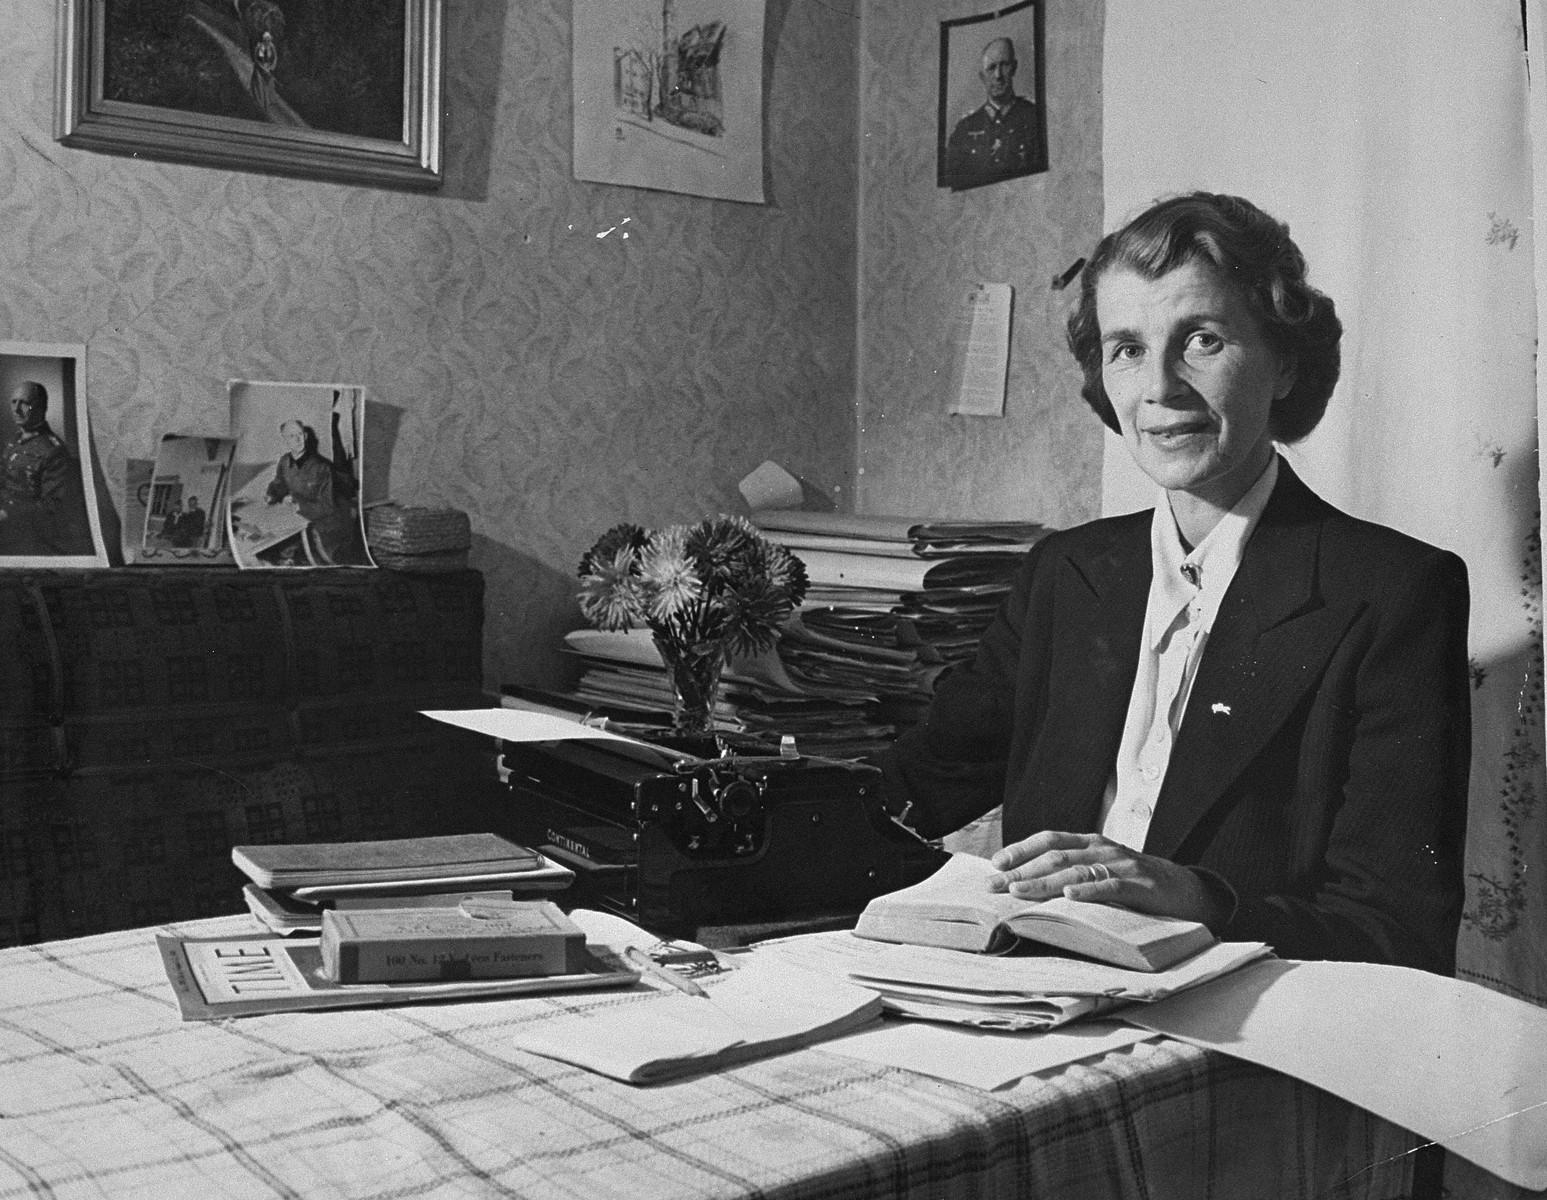 Frau Jodl, working on the defense of her husband, defendant Alfred Jodl, during the International Military Tribunal trial of war criminals at Nuremberg.